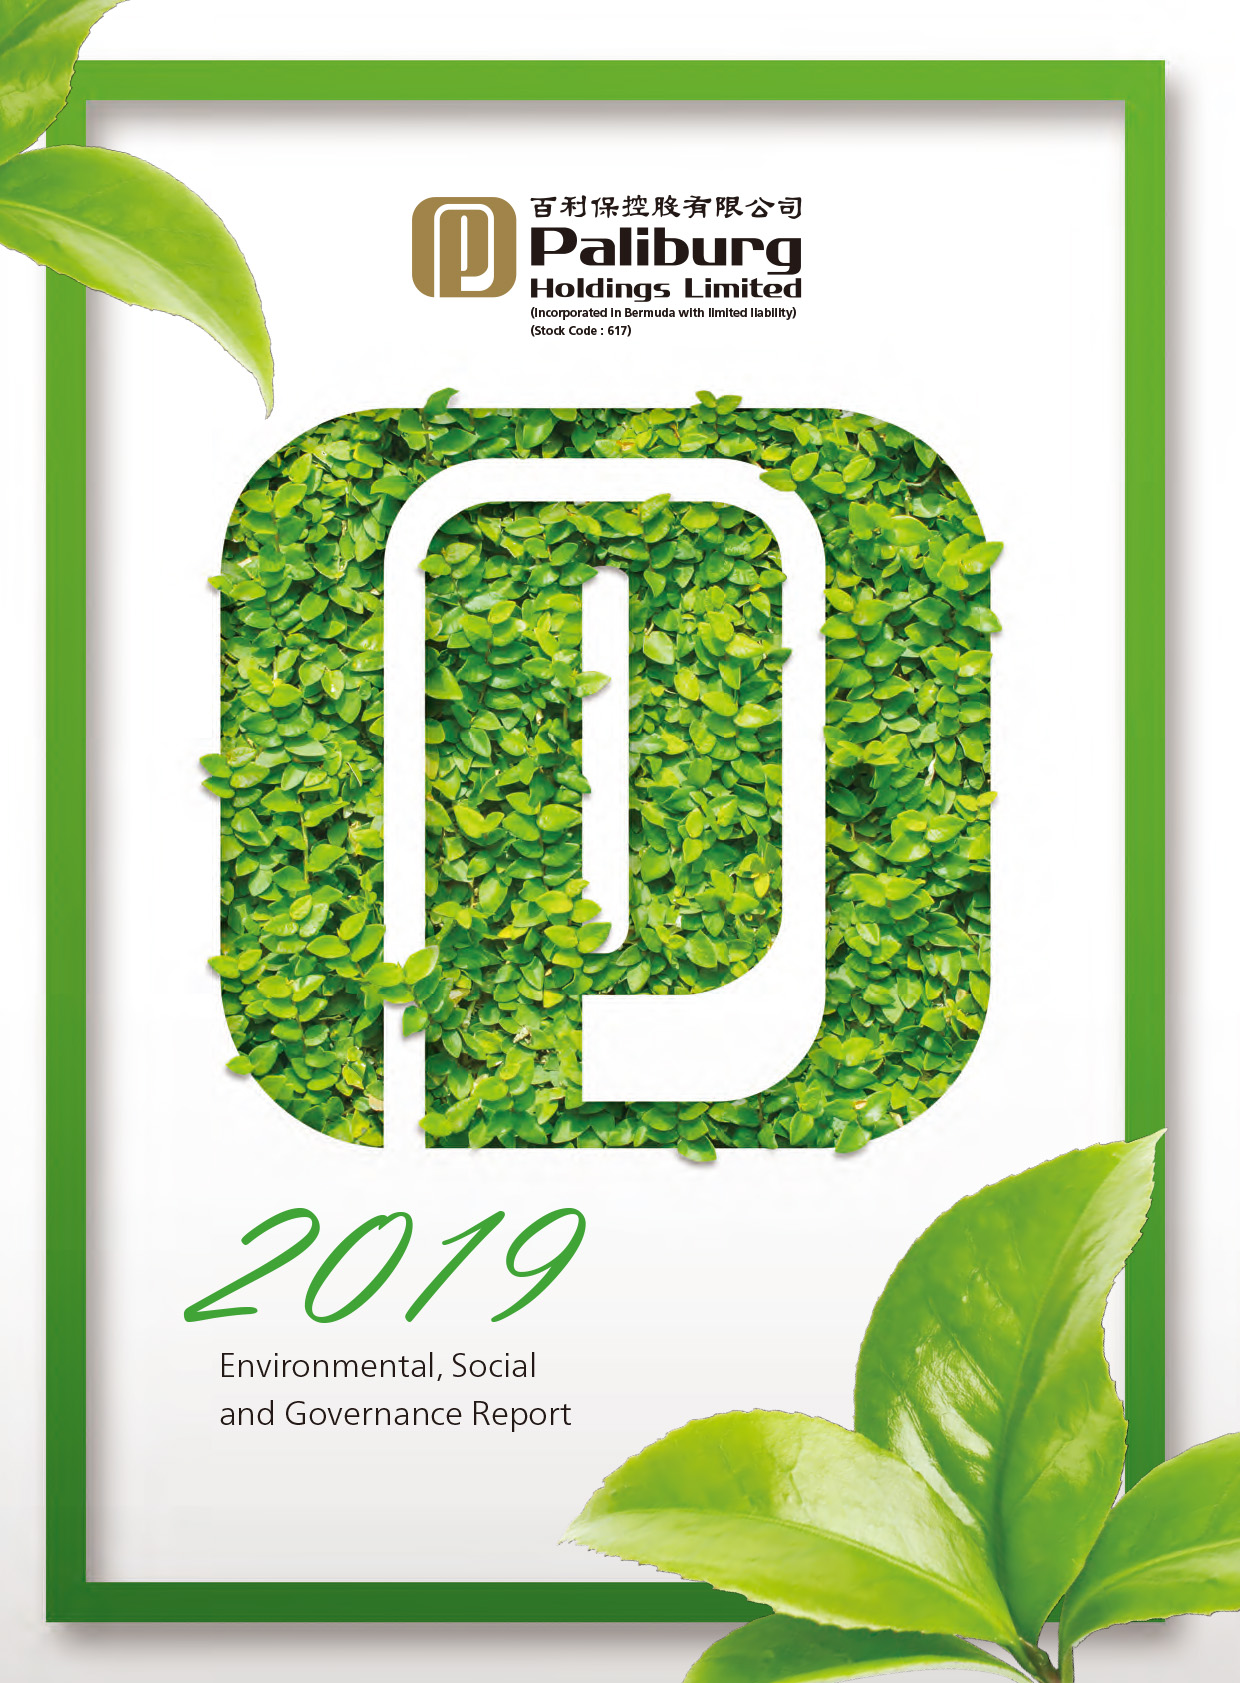 Paliburg Holdings Limited ESG